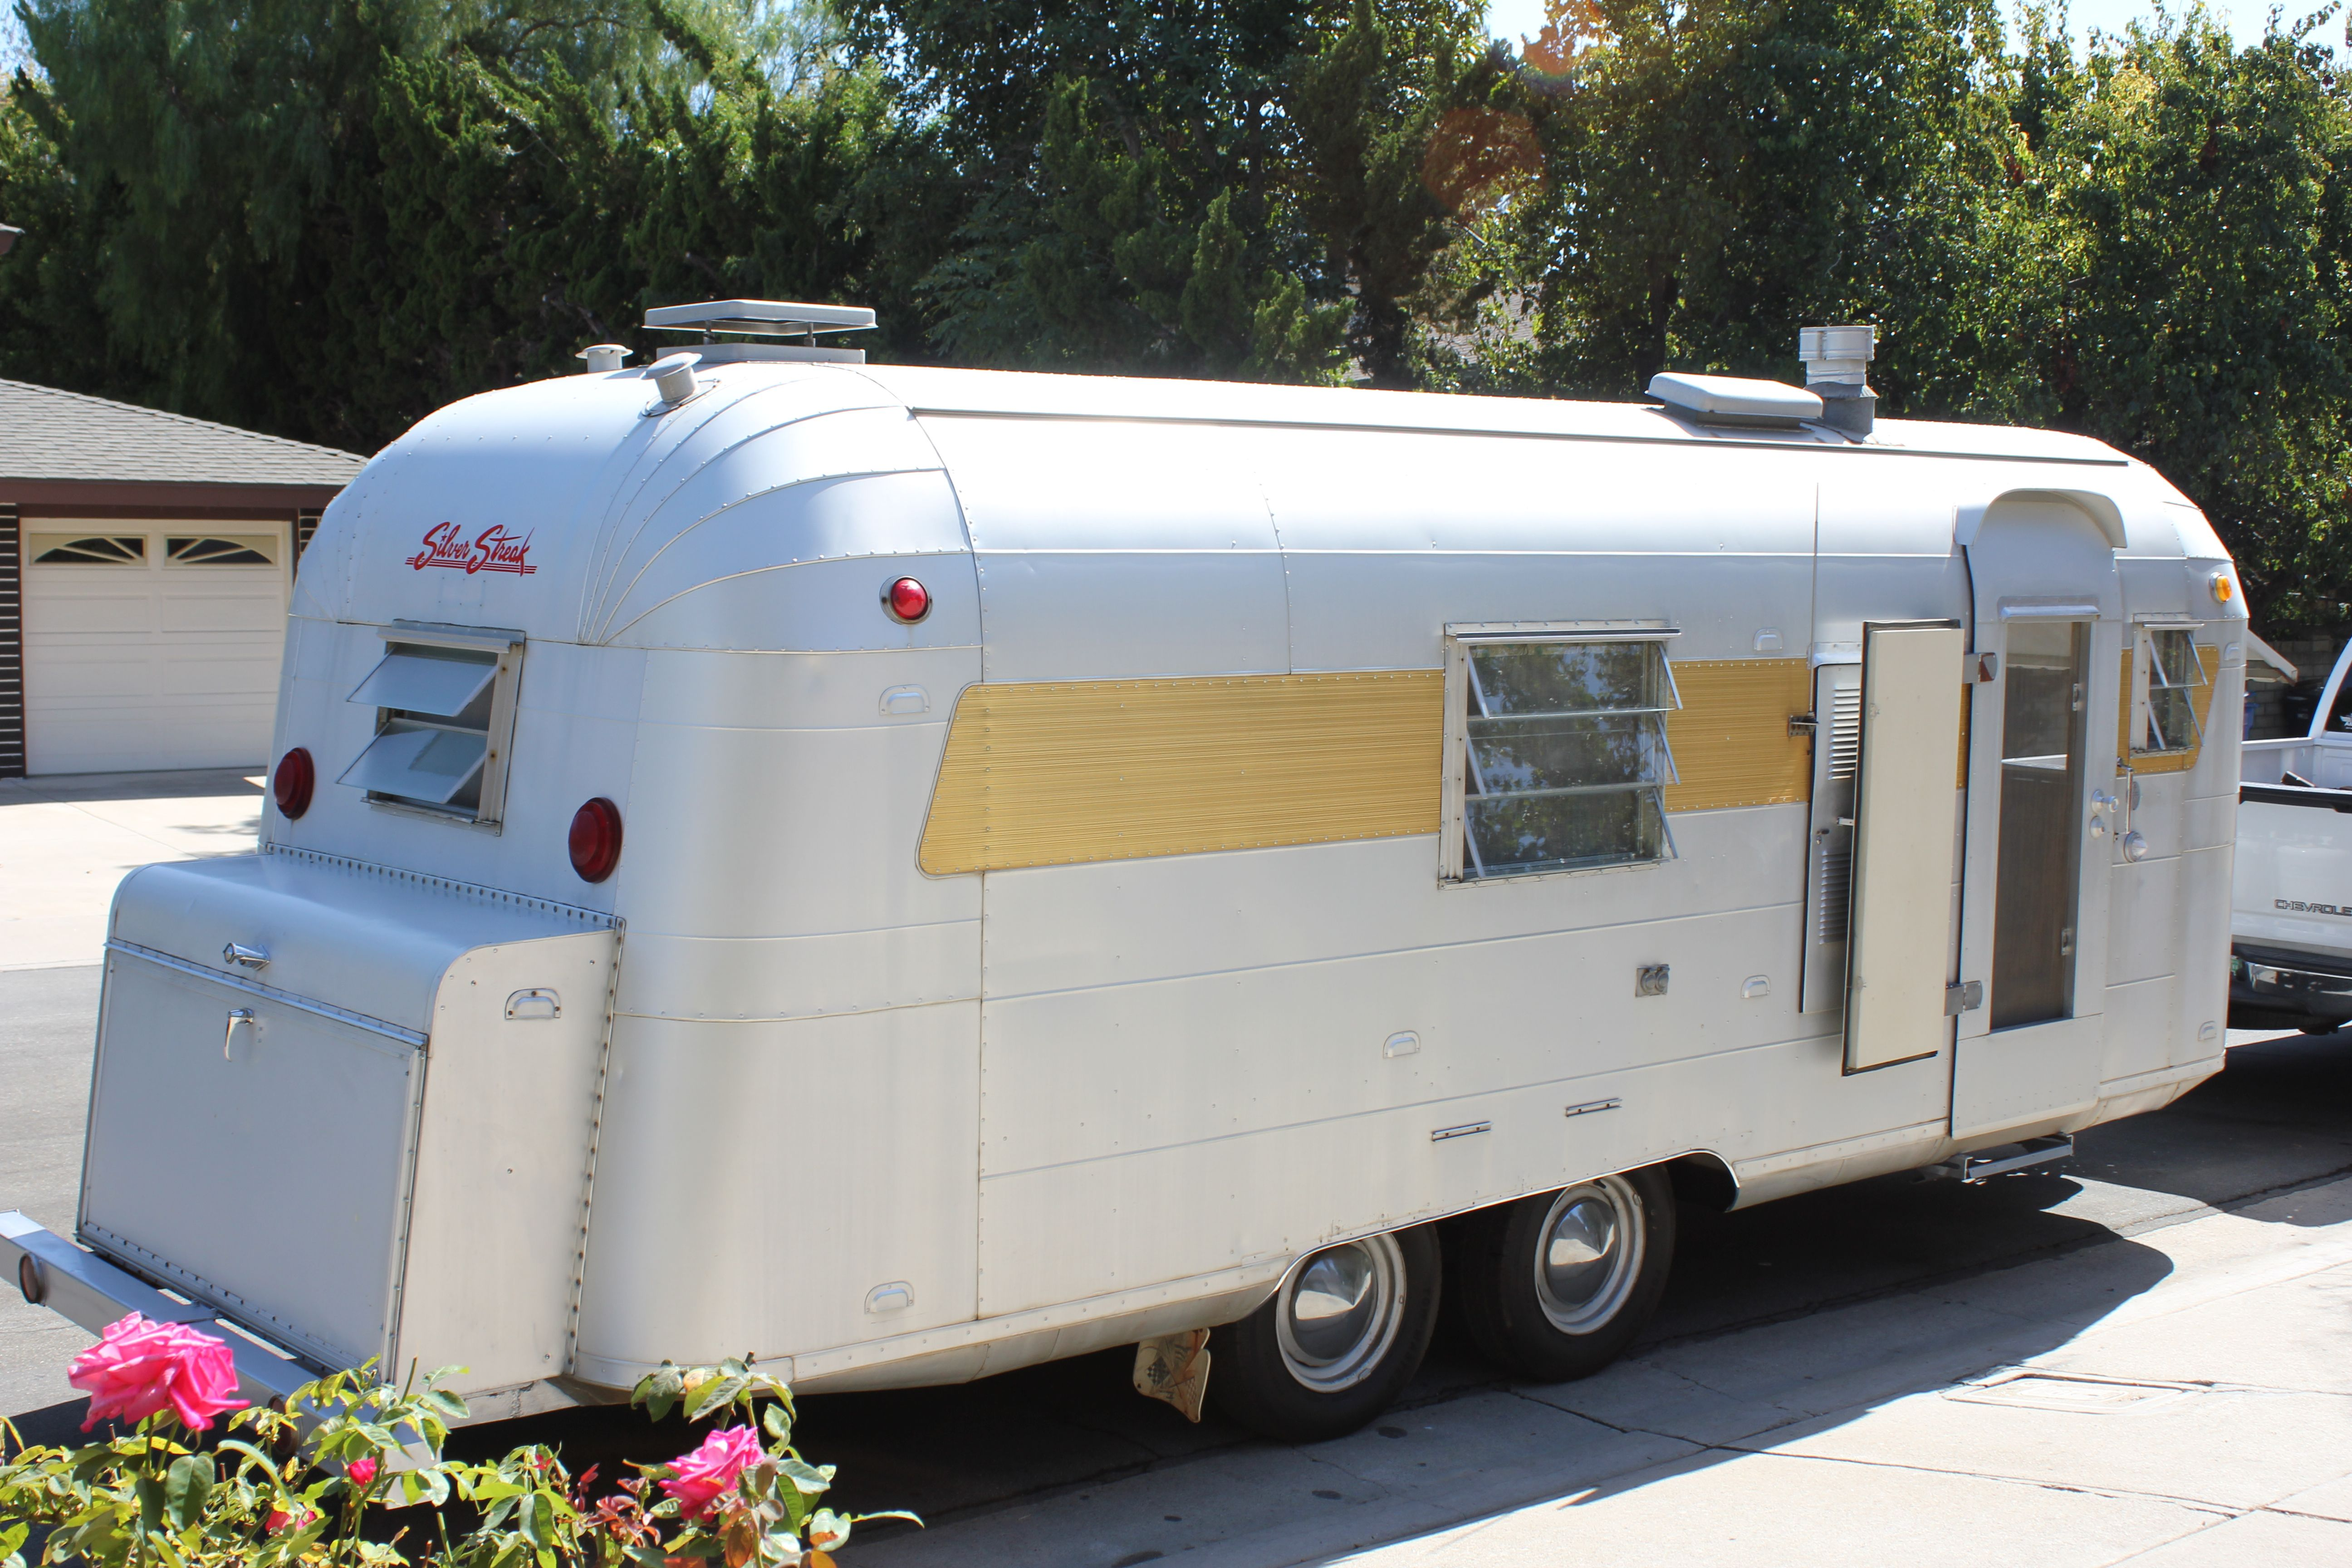 Used Campers For Sale Near Me >> Silver Streak Trailer | 1967 Vintage Silver Streak ...